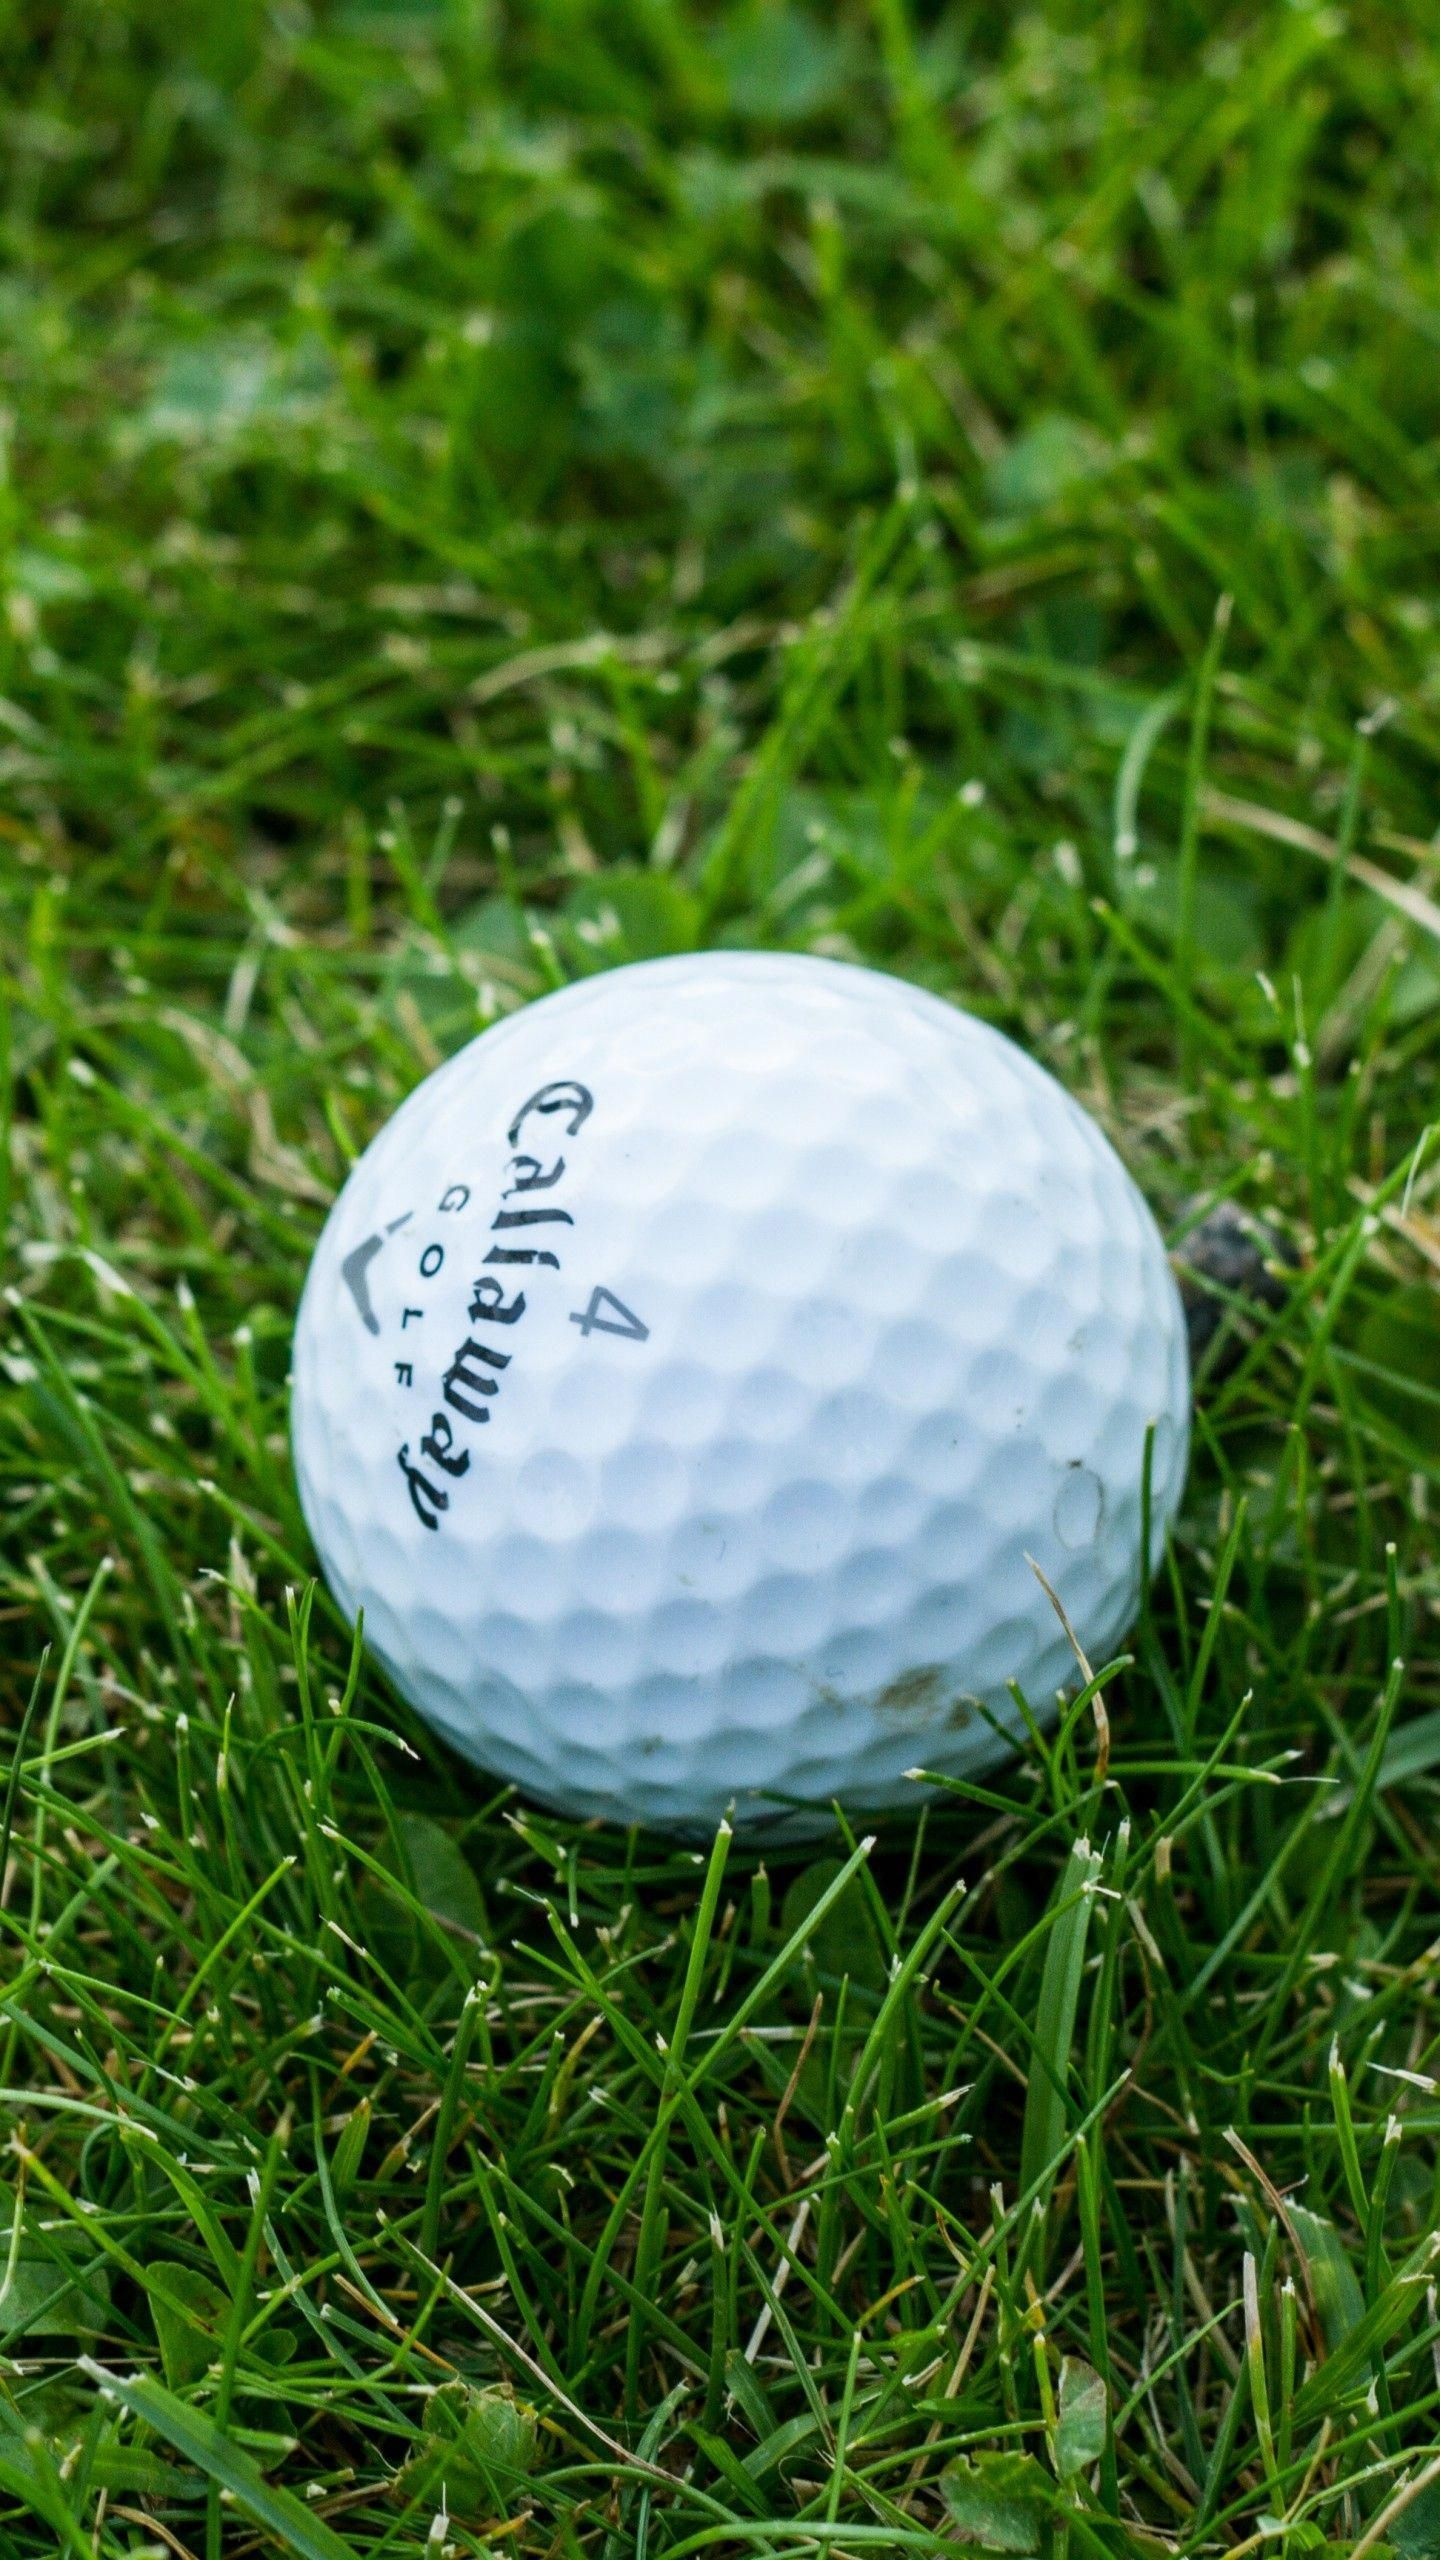 Callaway 4 The New Age Golf Ball In 2021 Golf Ball Golf Samsung Galaxy